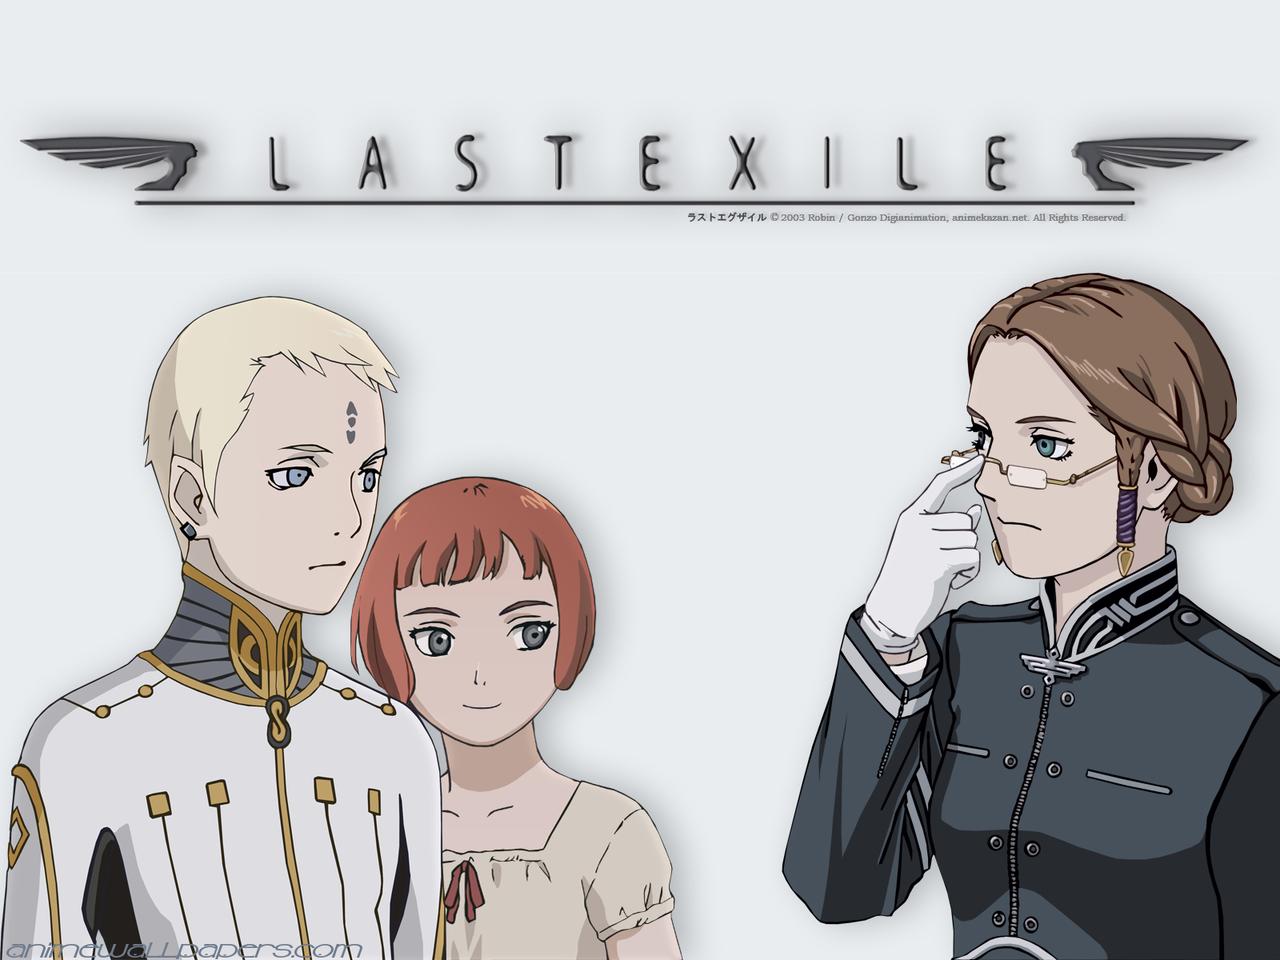 Last Exile Anime Wallpaper # 9